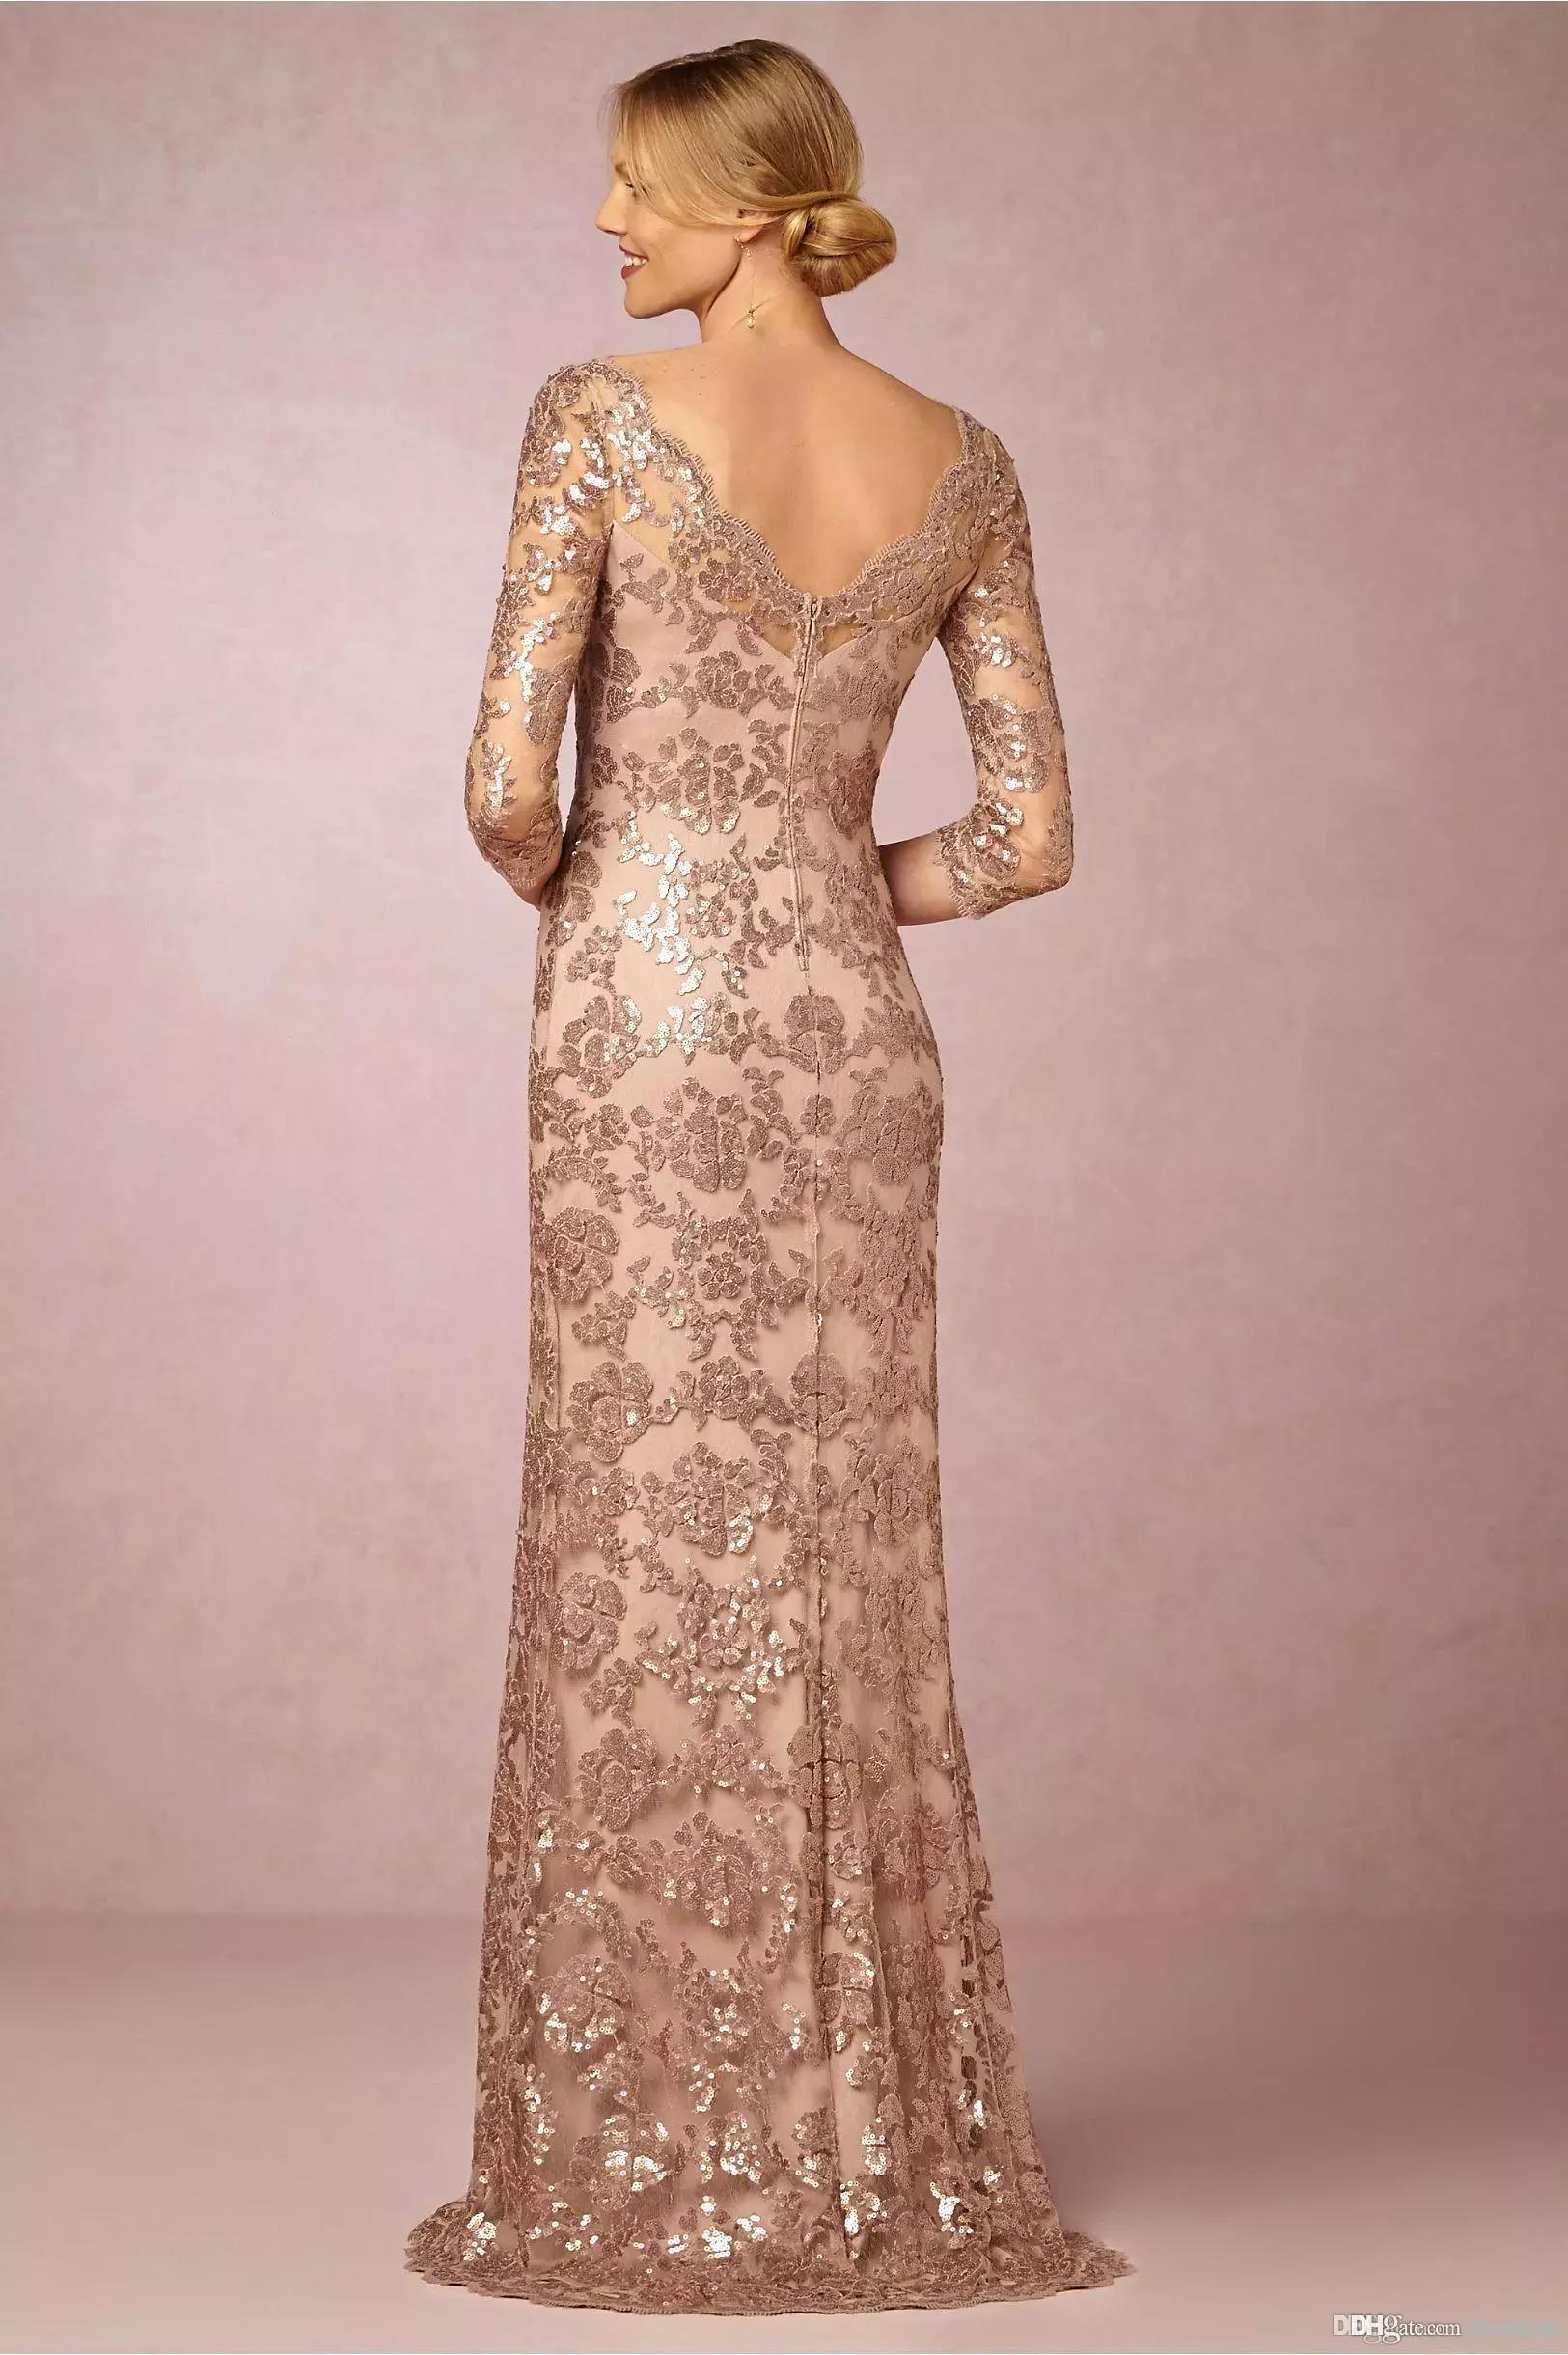 2018 Designer Elegant Rose Gold Sequins Appliqued Mother of the Bride Dresses Cheap Evening Party Dress Formal Wedding Guest Gowns